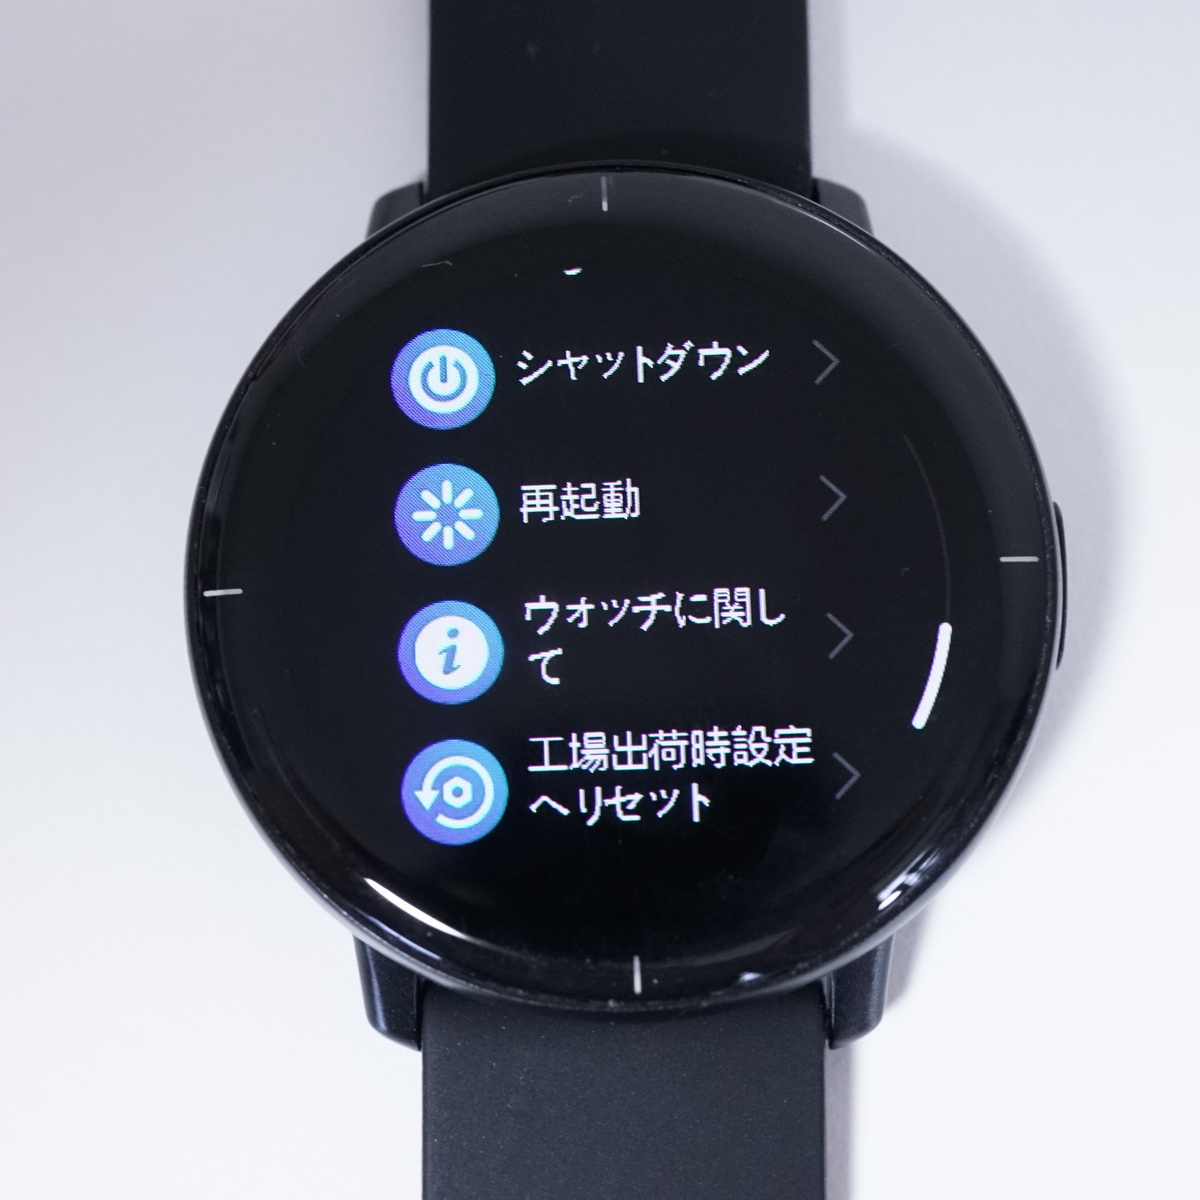 Mibro Lite の設定メニュー詳細